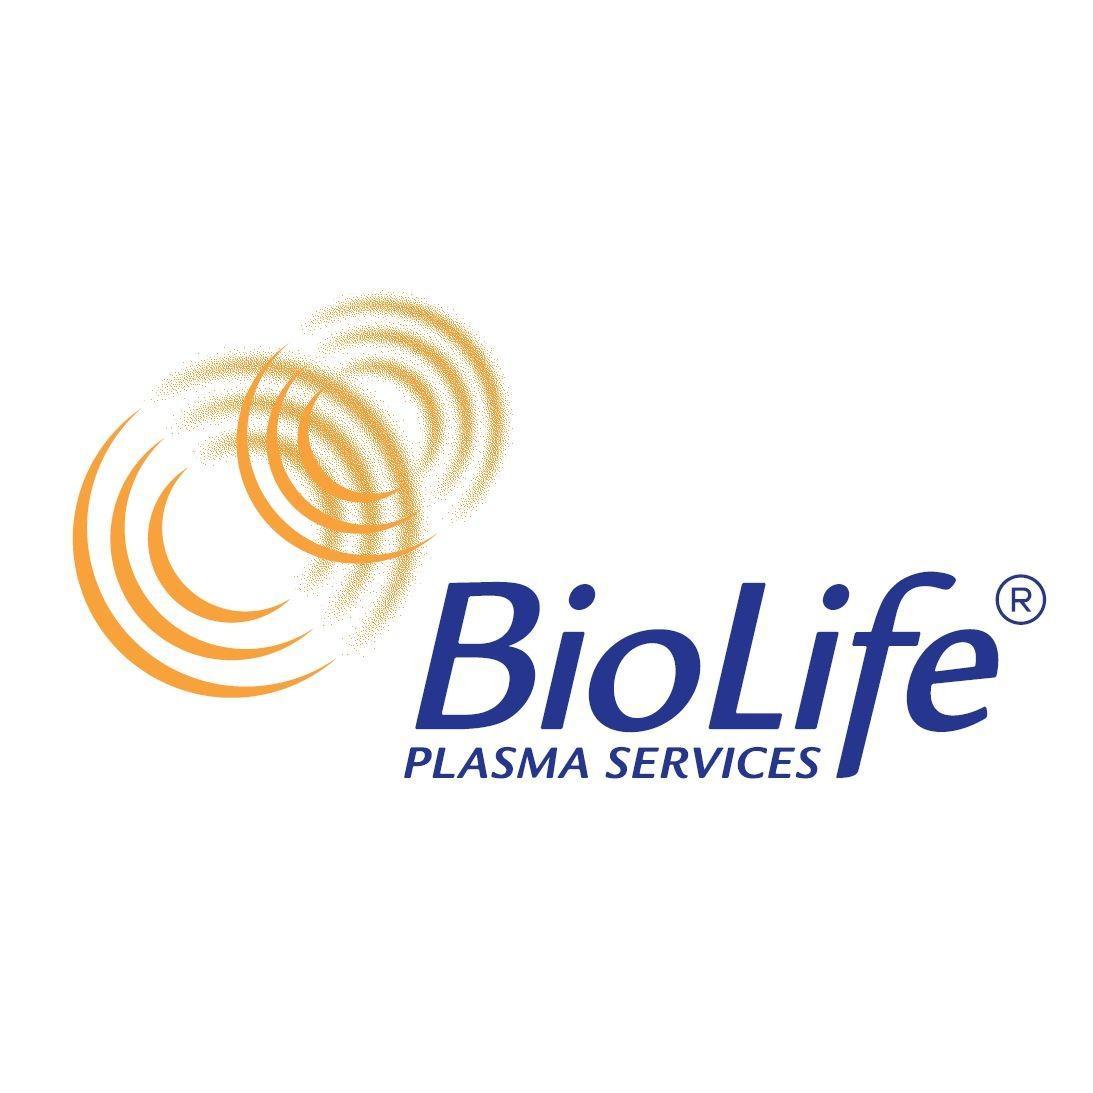 BioLife Plasma Services image 2